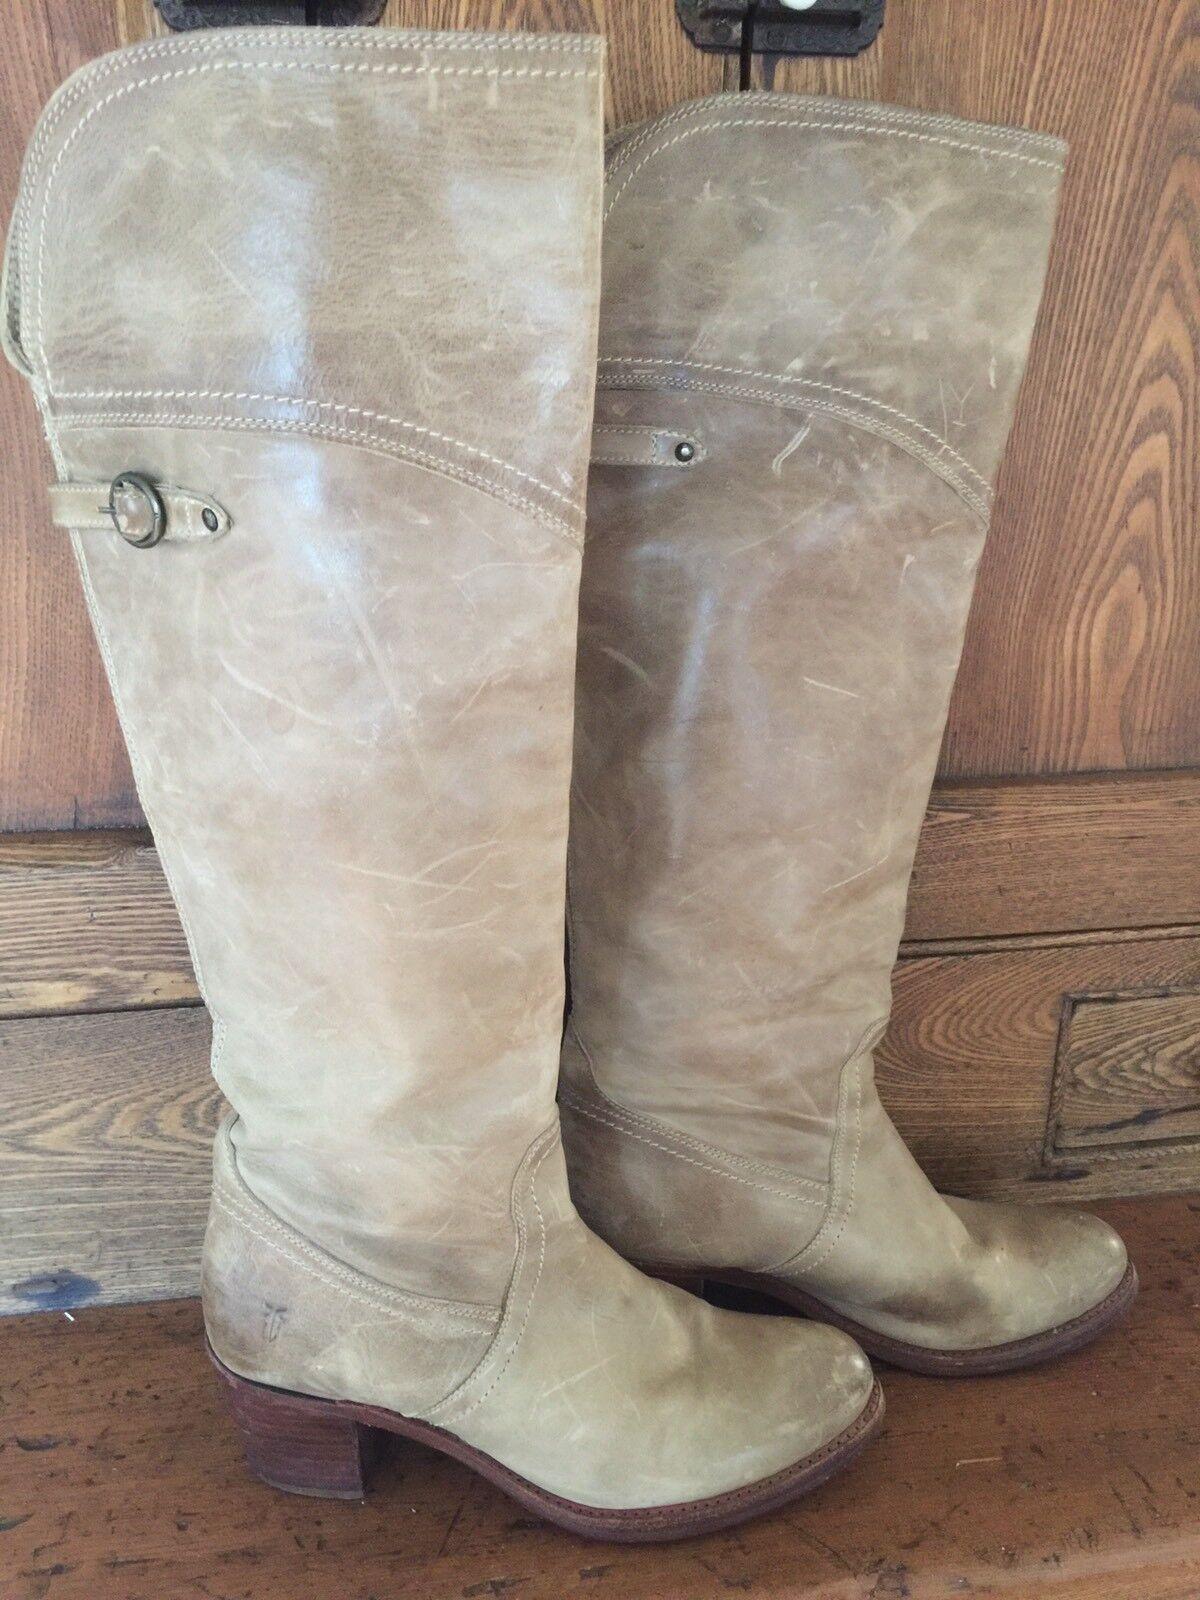 Frye Jane 9.5 OTK tall cuff heel riding Stiefel taupe grau distressed leather GUC